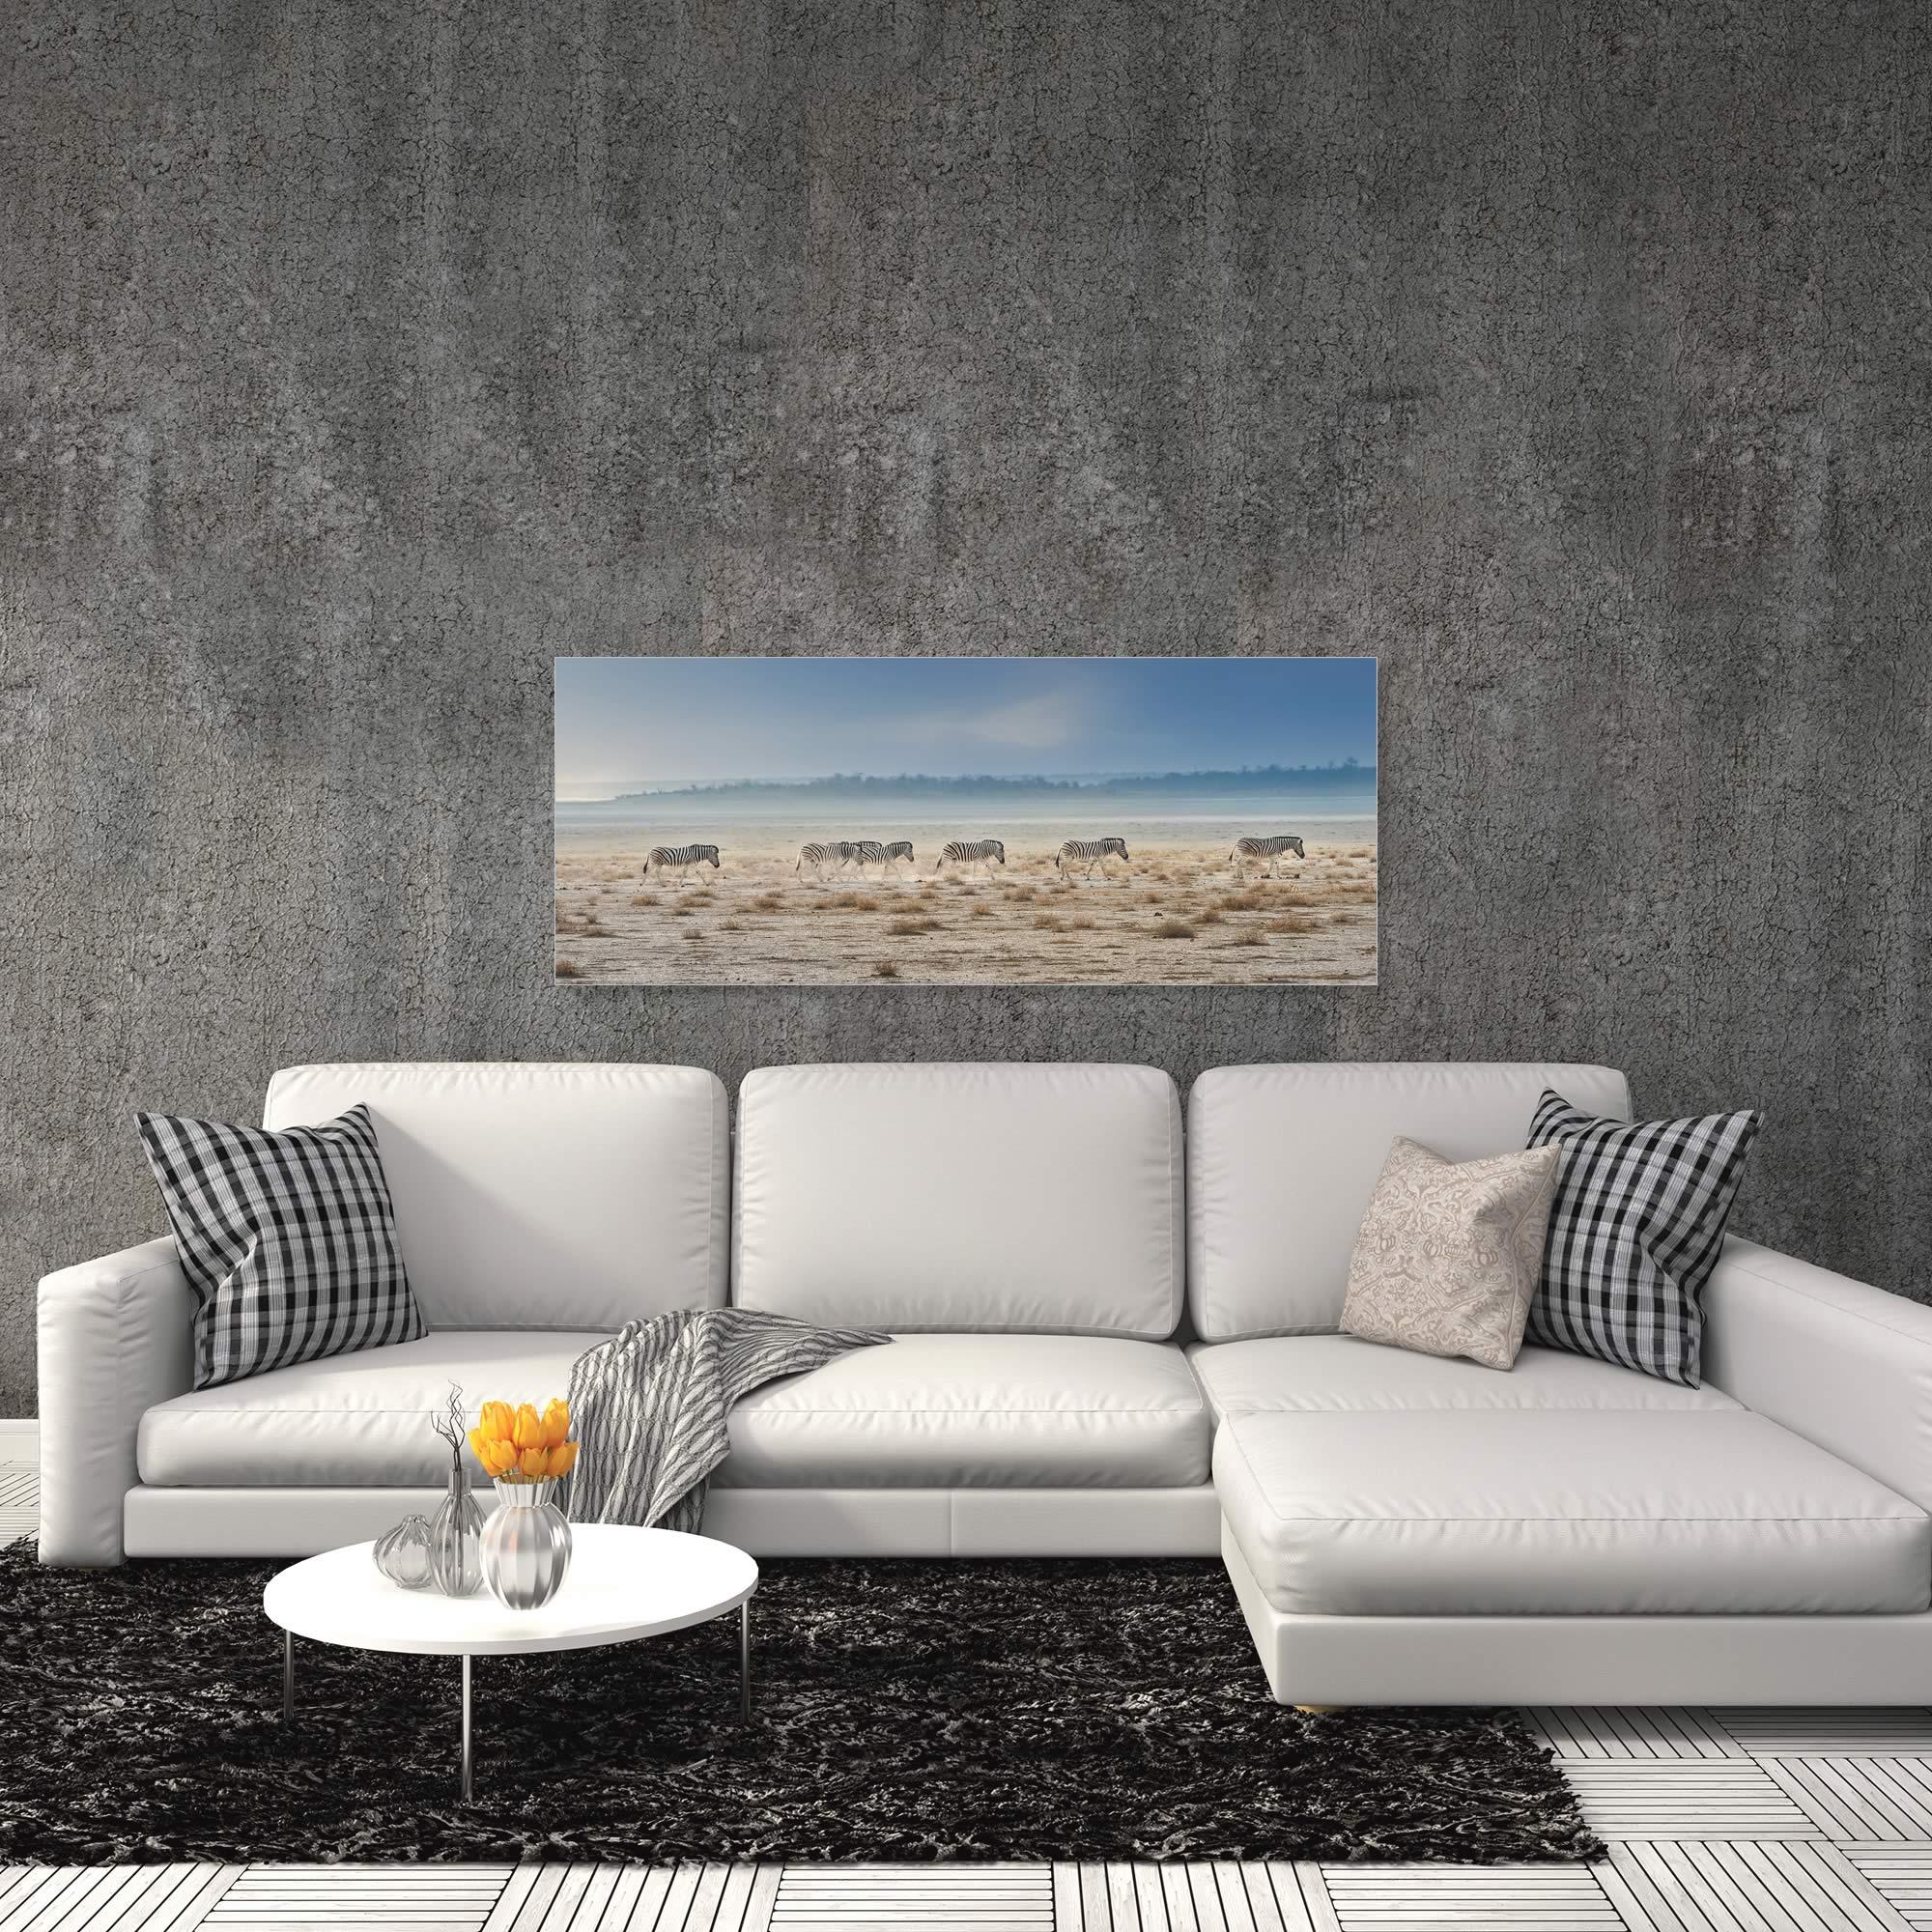 Zebra Promenade by Piet Flour - Zebra Wall Art on Metal or Acrylic - Alternate View 1